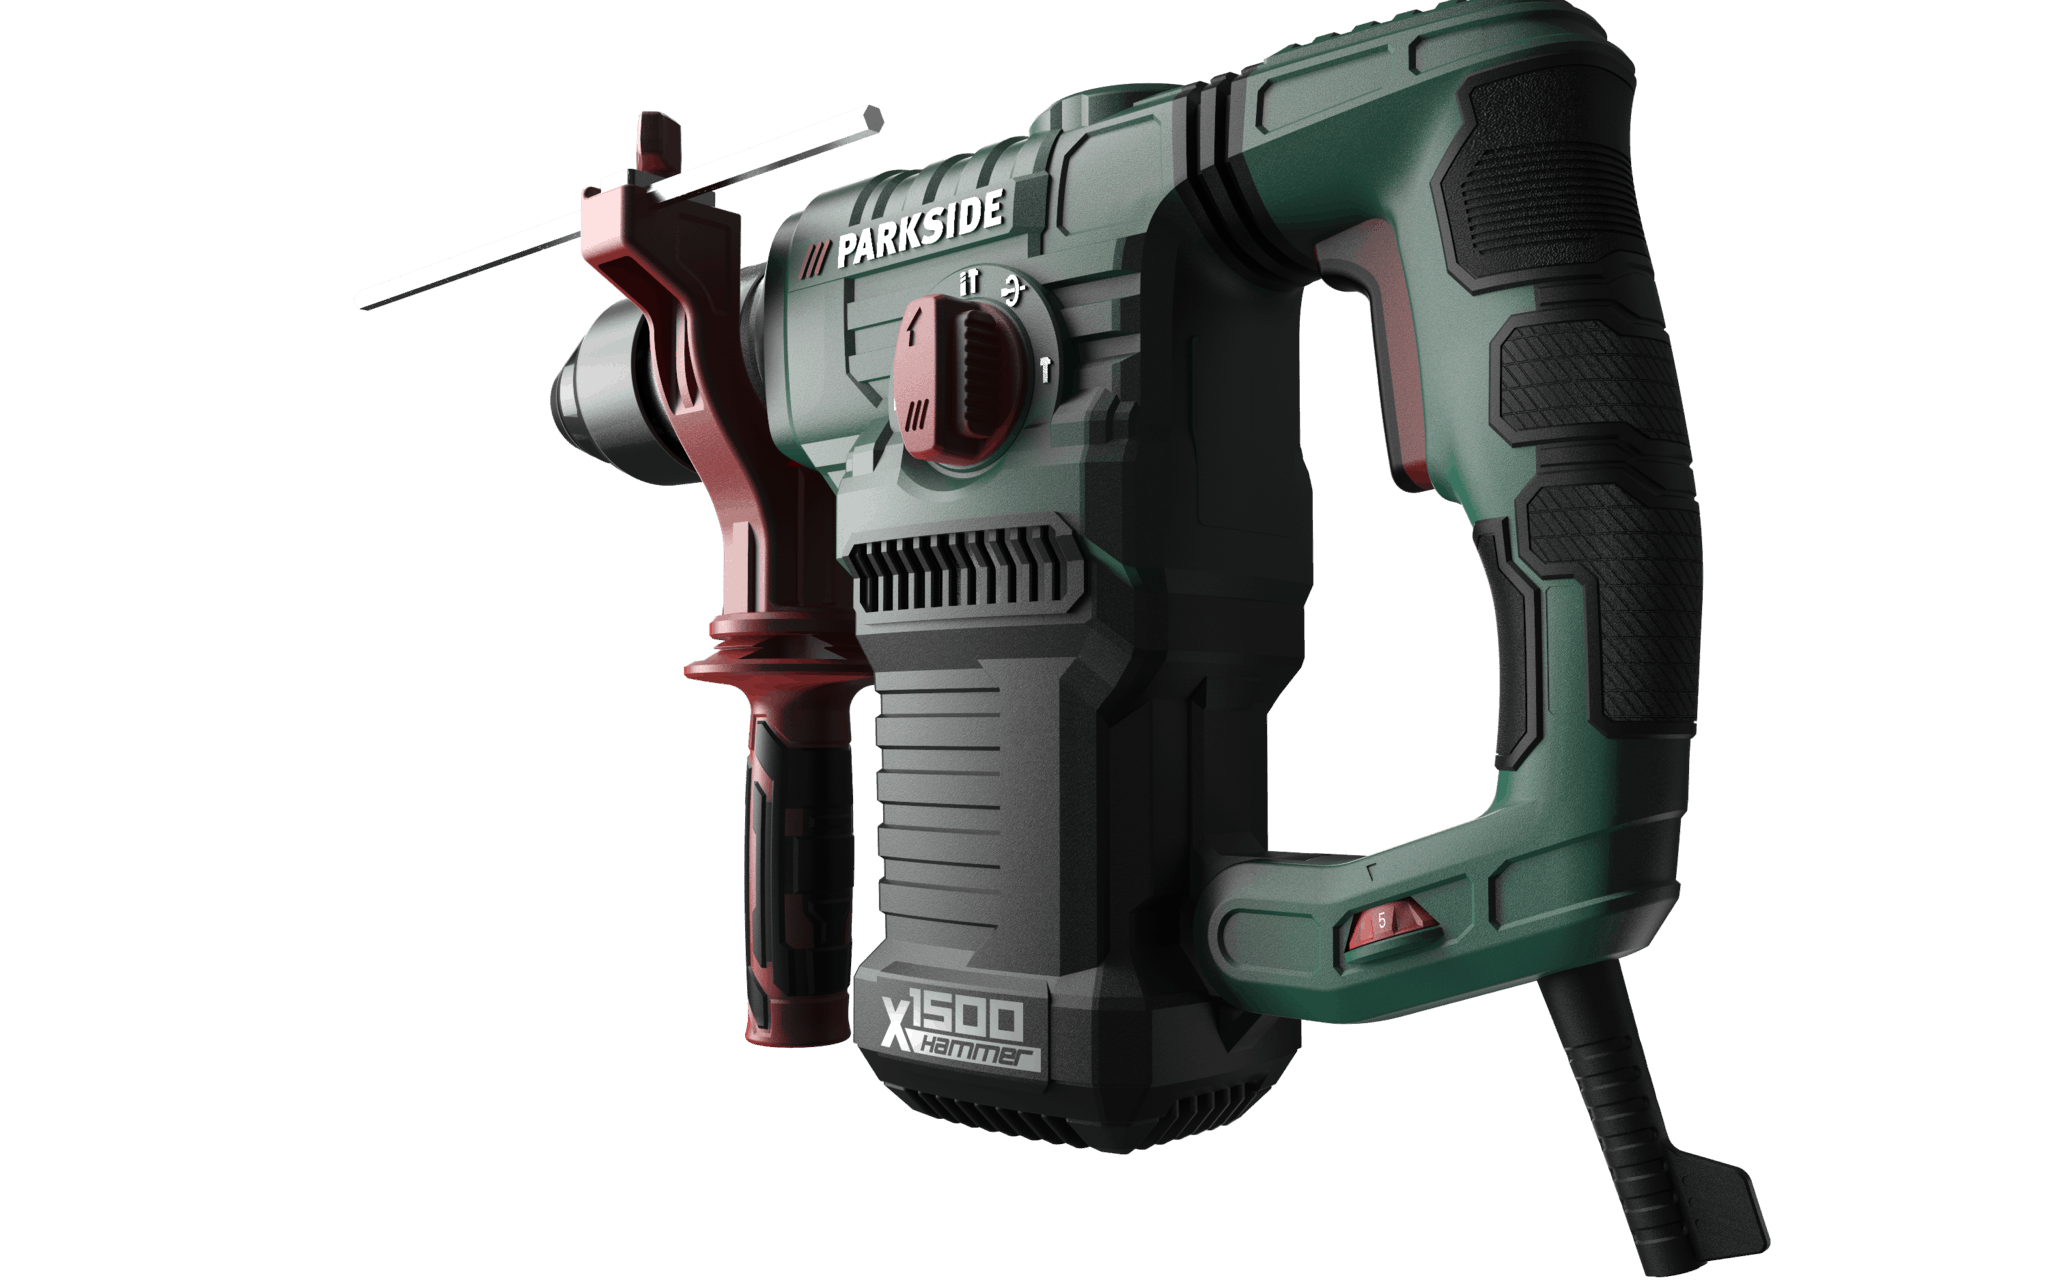 parkside_hammer_heavy_duty_industrialdesign_projekter_id